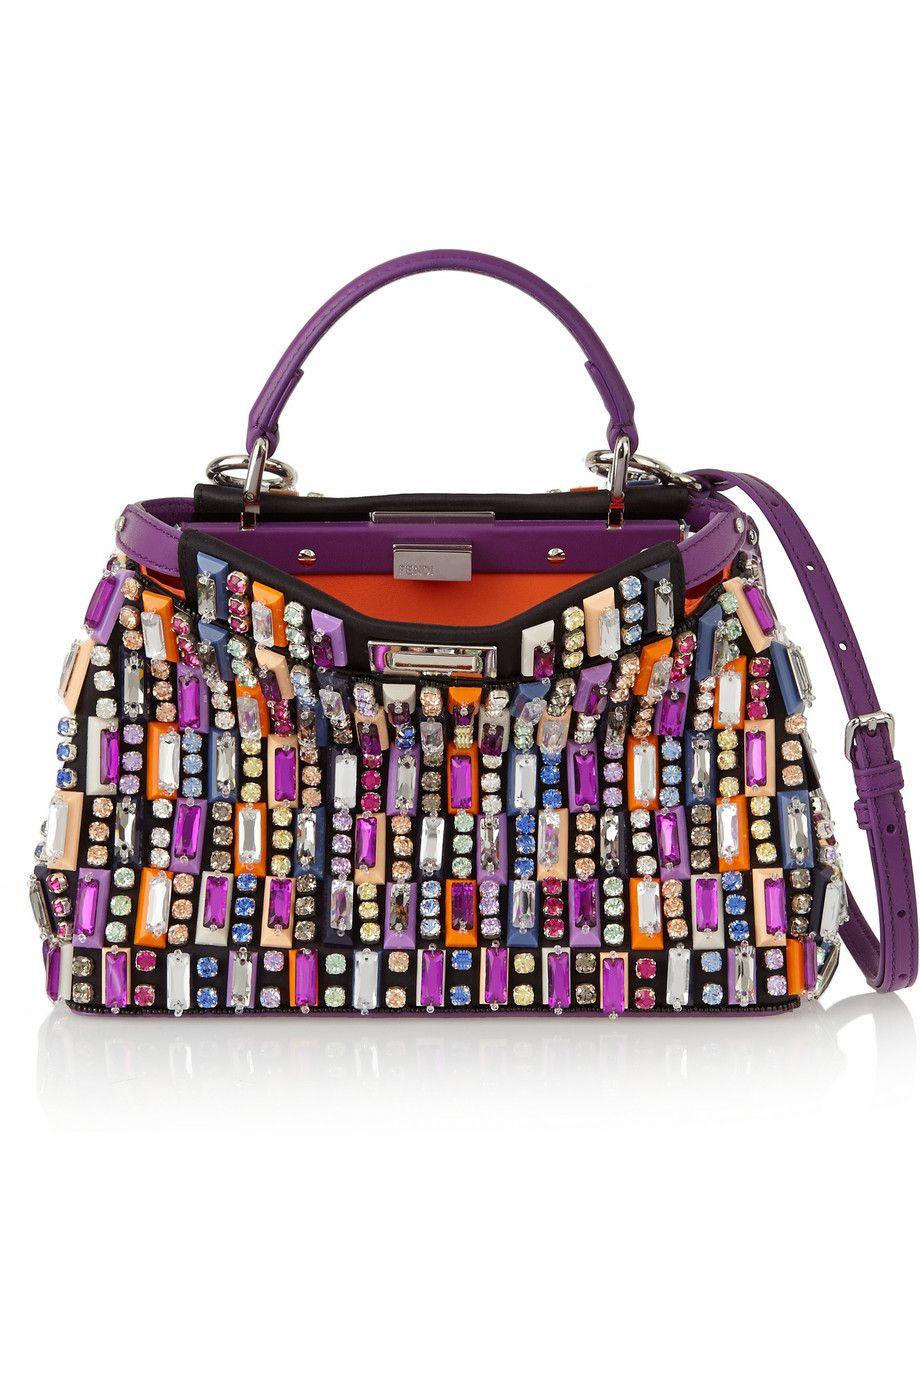 2b06e20c04 Fendi - Peekaboo mini embellished satin and leather shoulder bag